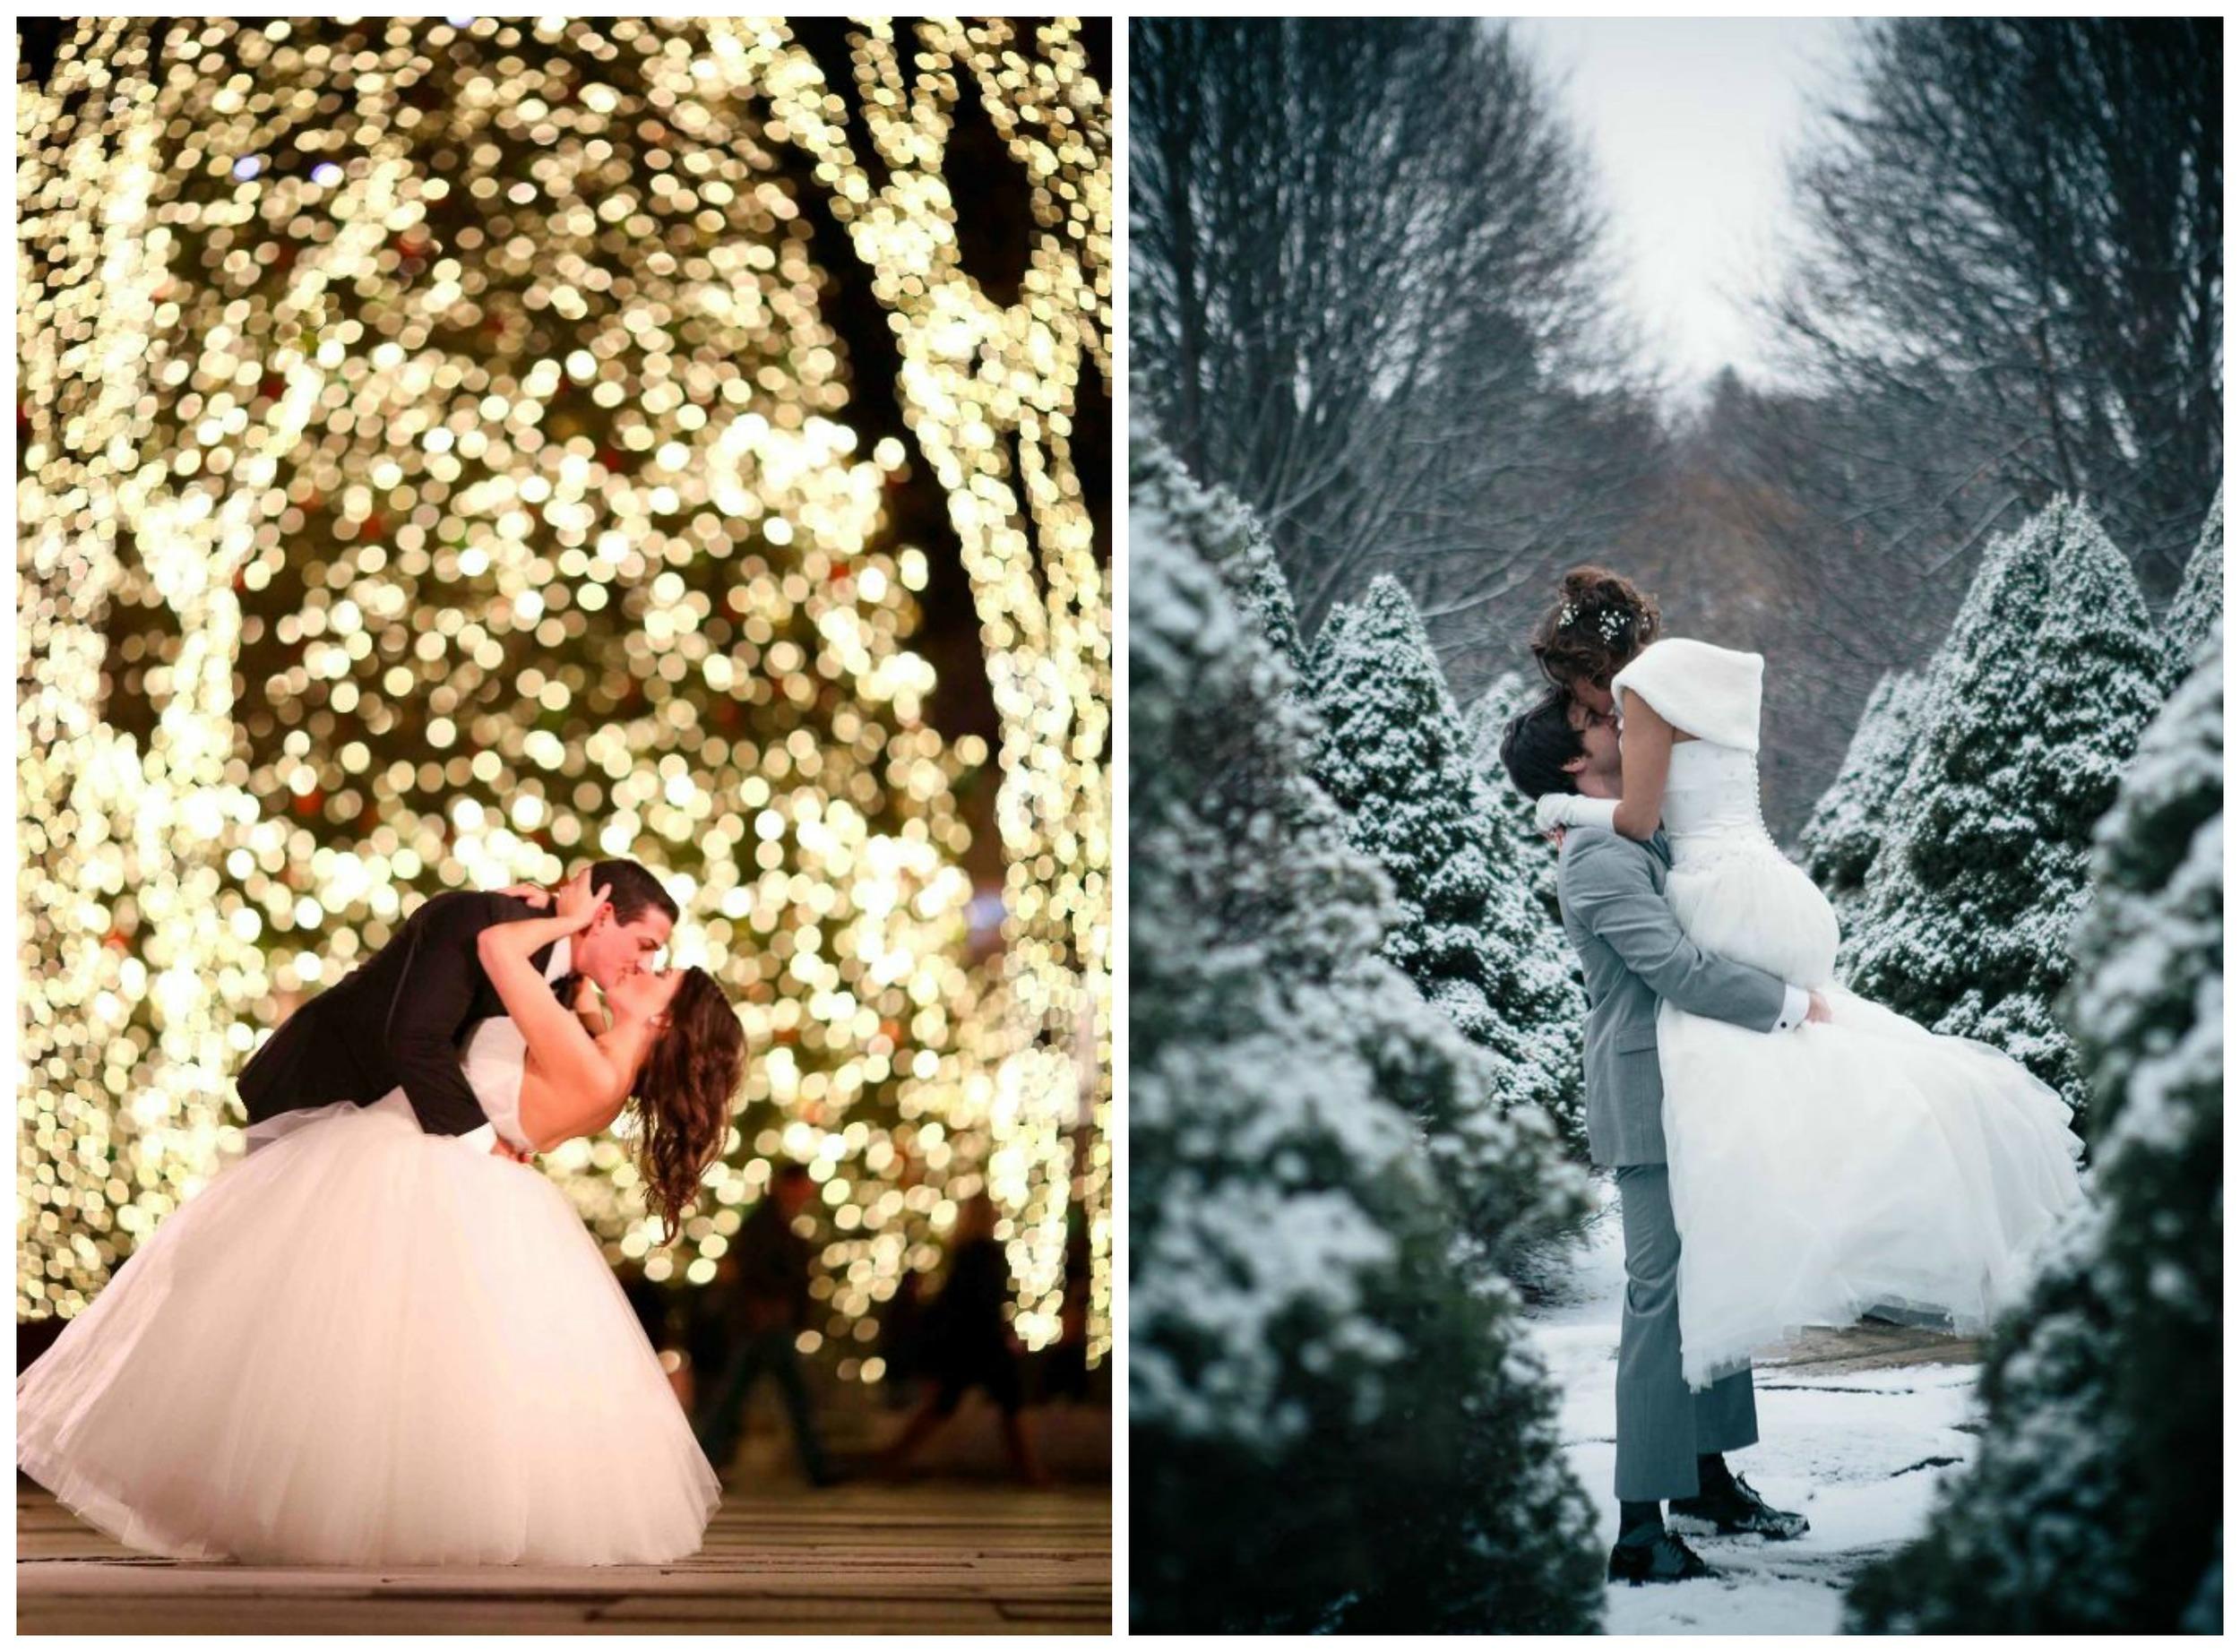 Colin Cowie Weddings ;  Hops Koch Photography